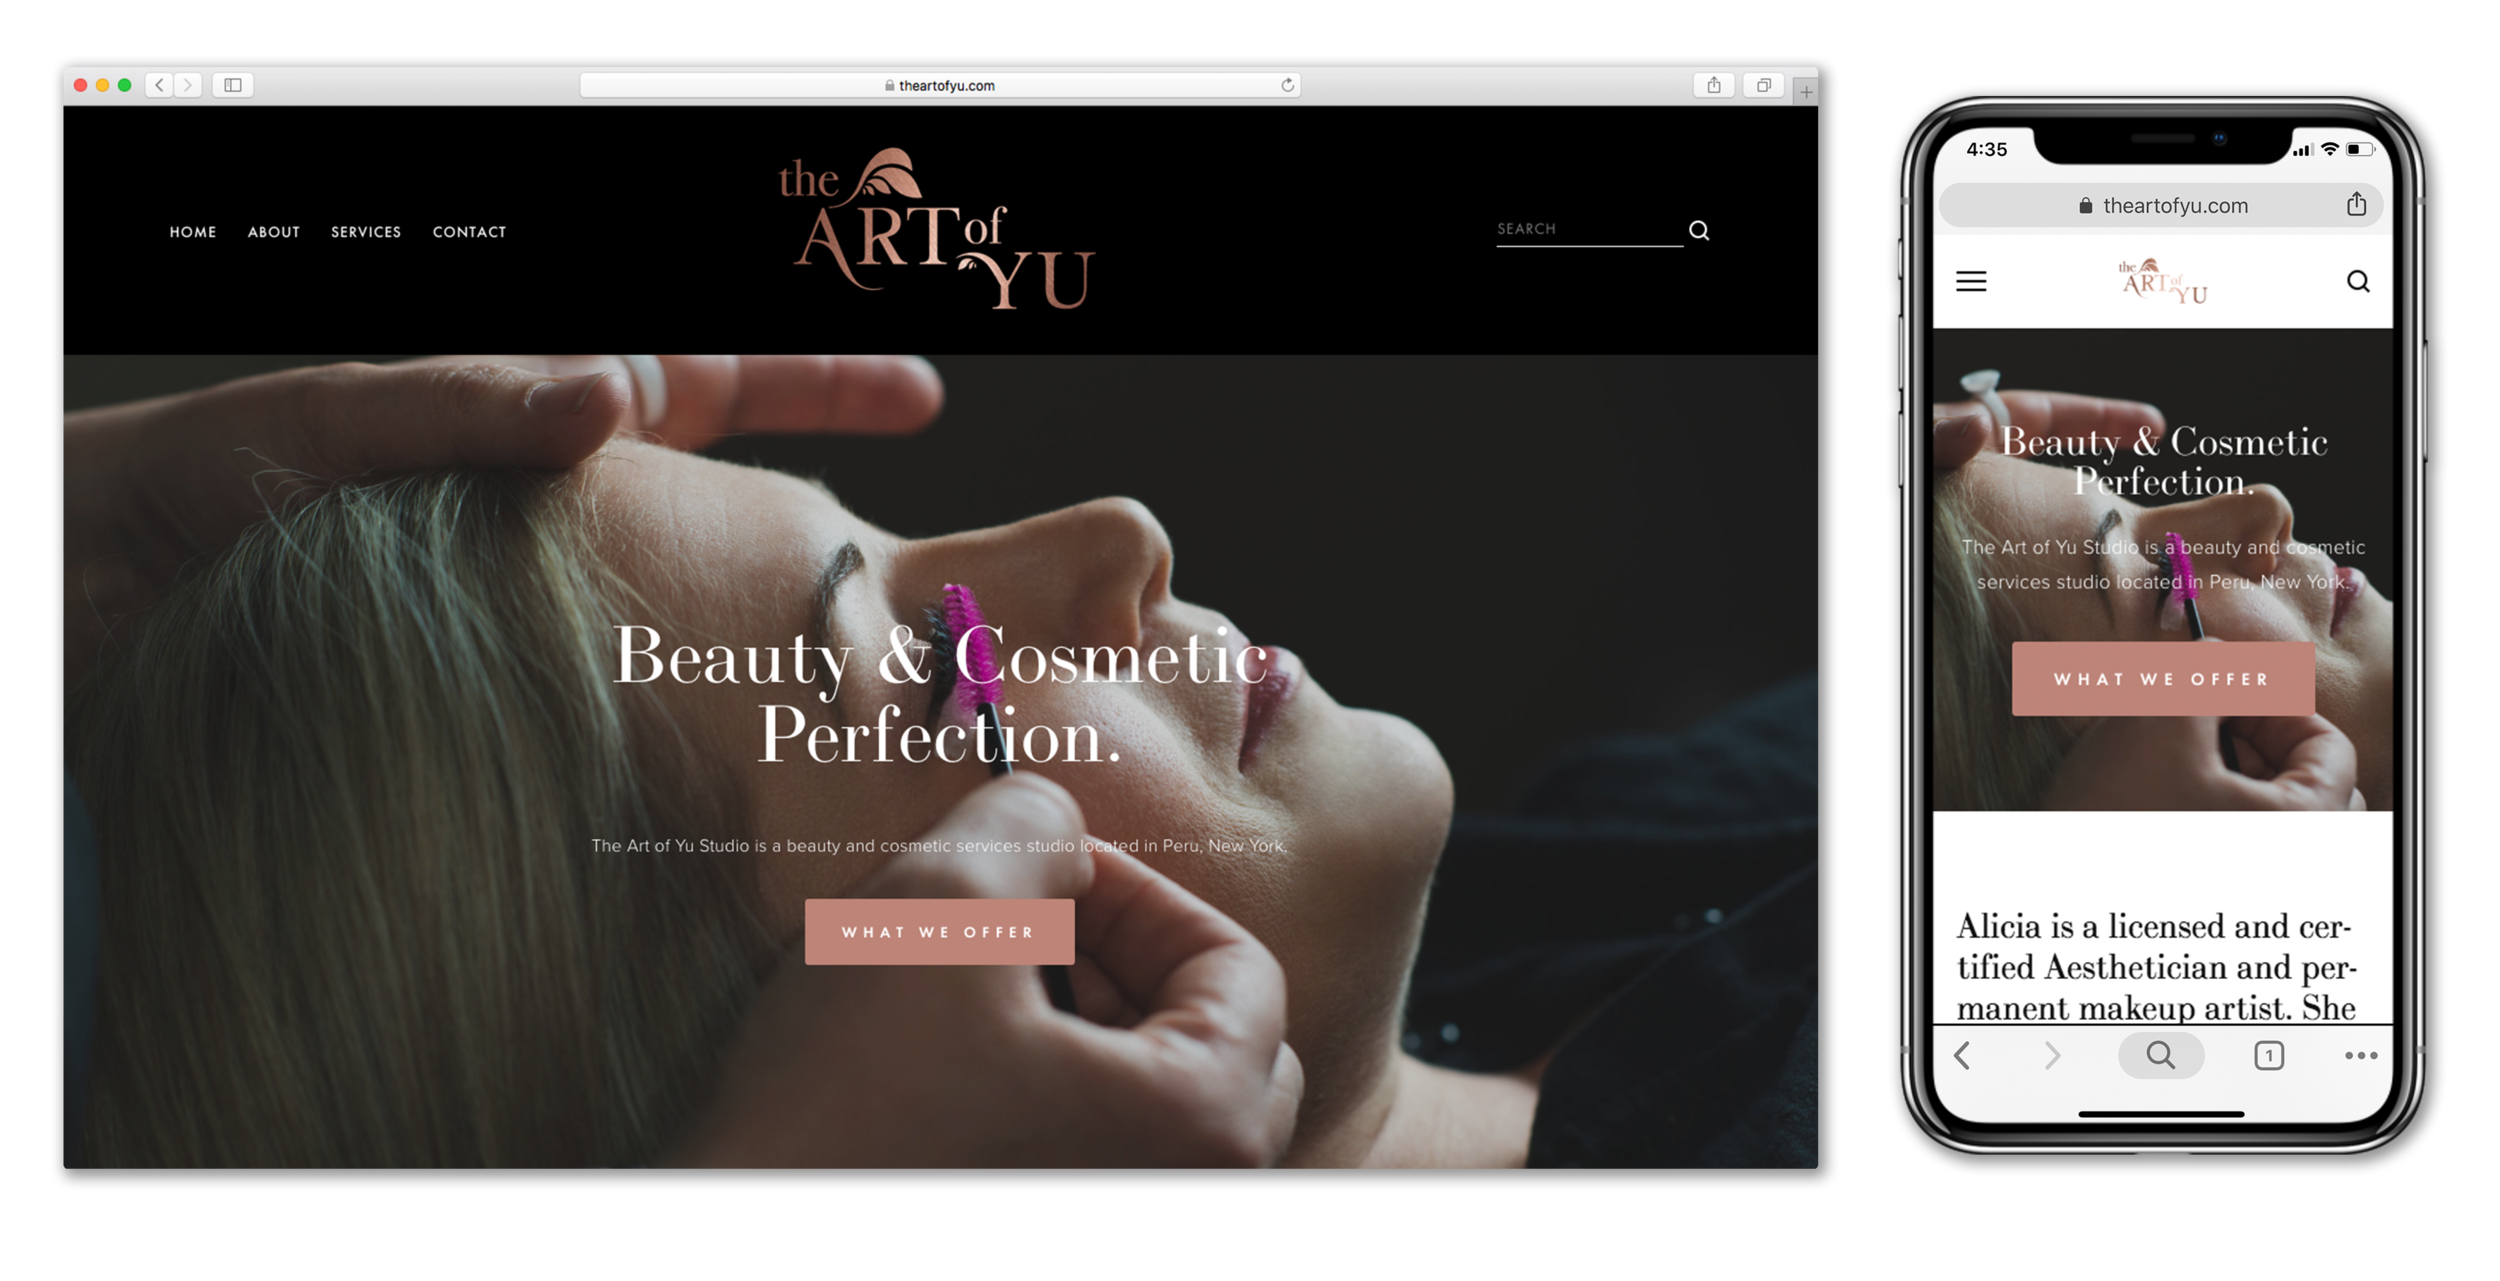 The Art of Yu Website